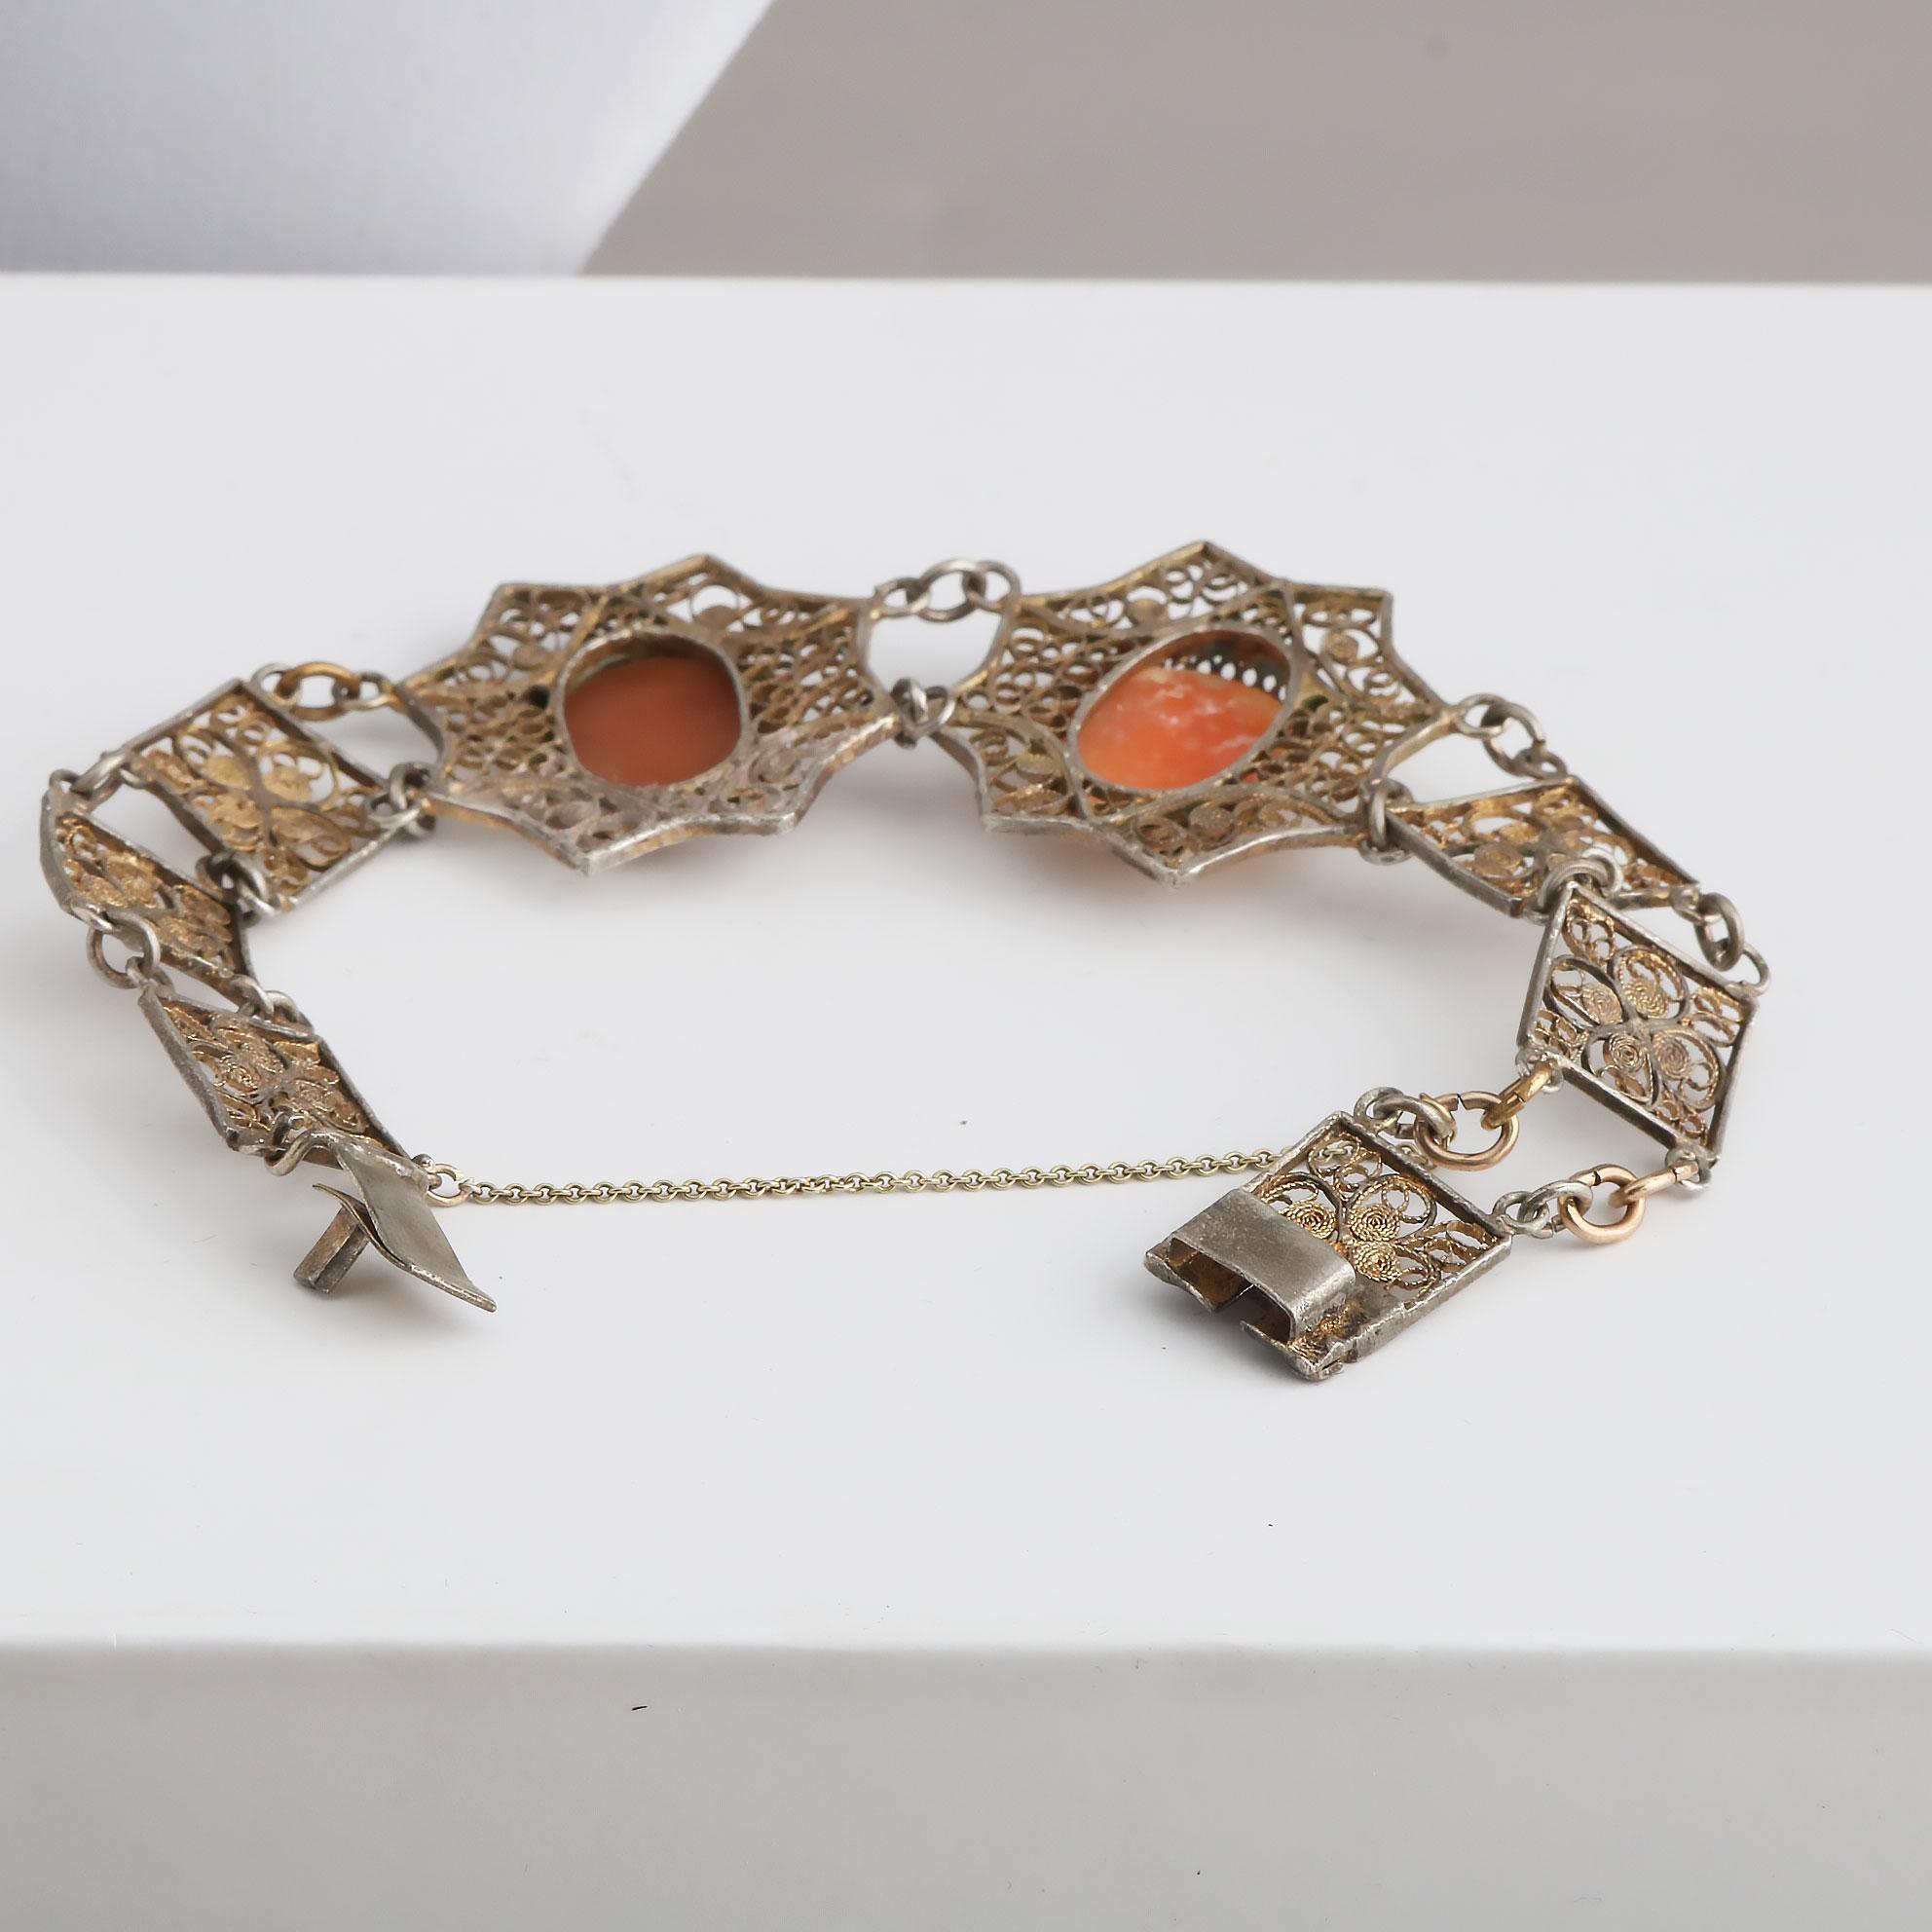 Kamé armbånd, forgyllet sølv, filigran